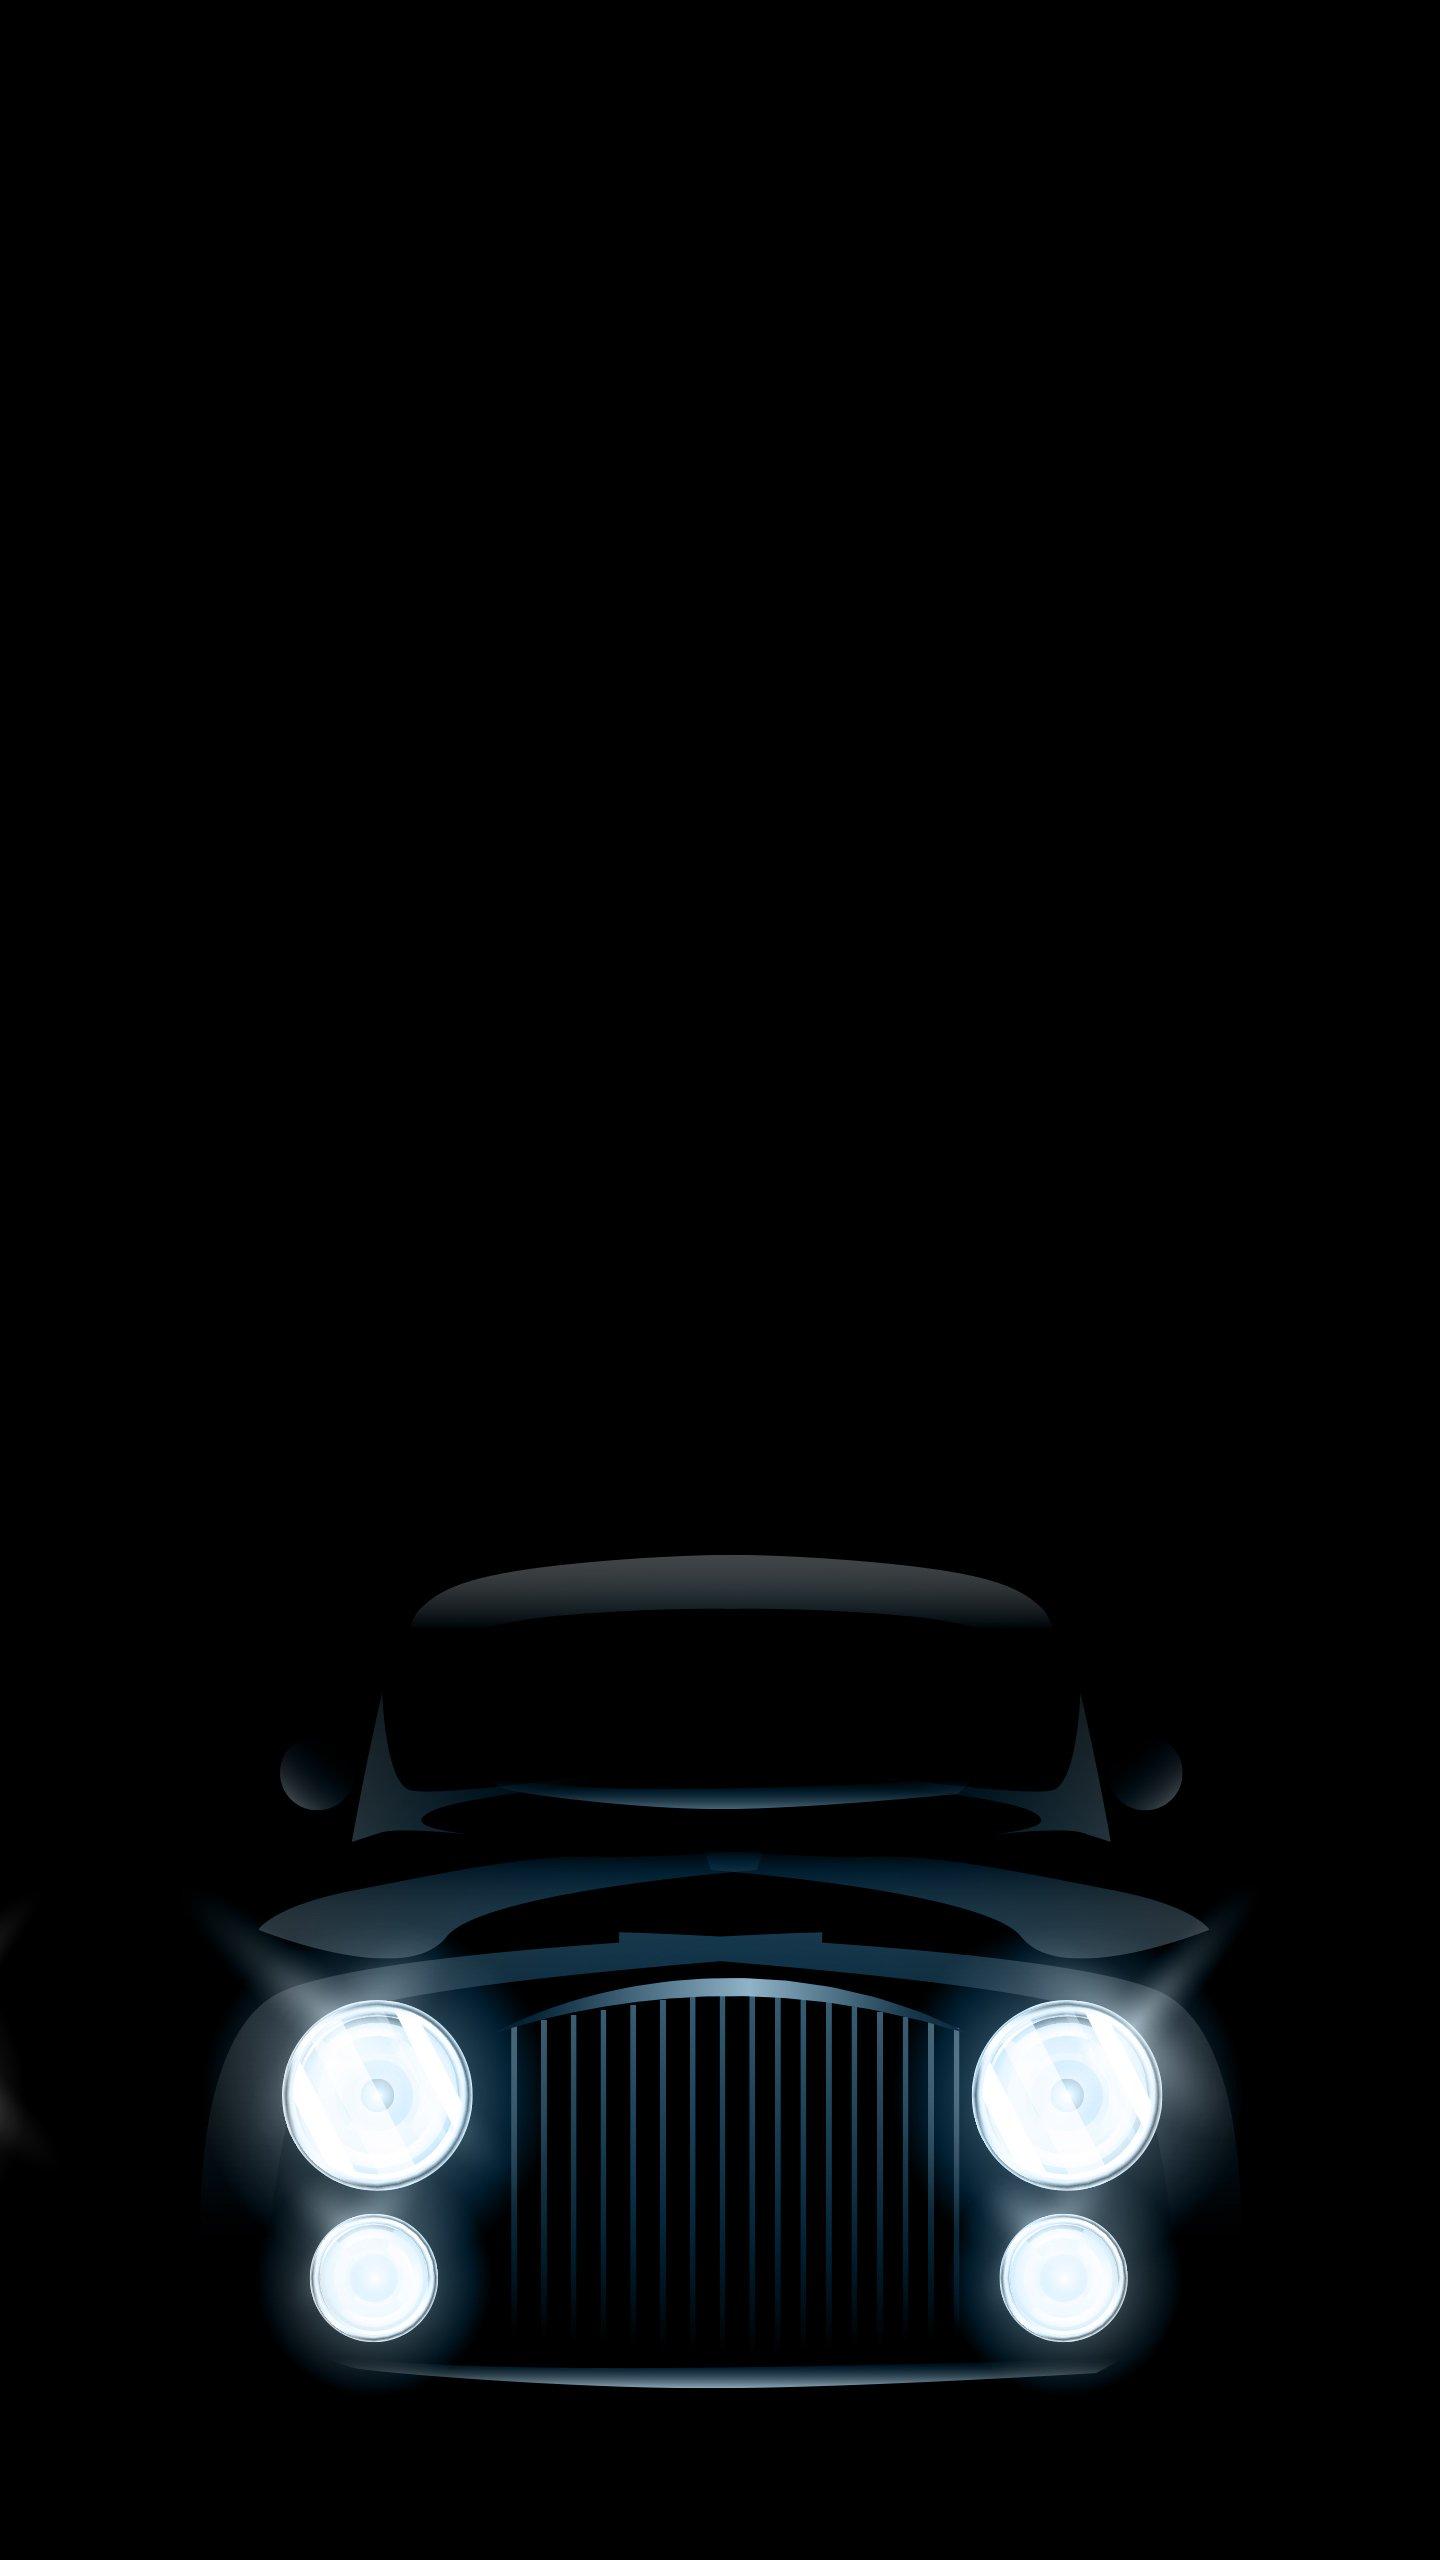 Dark Car Wallpaper